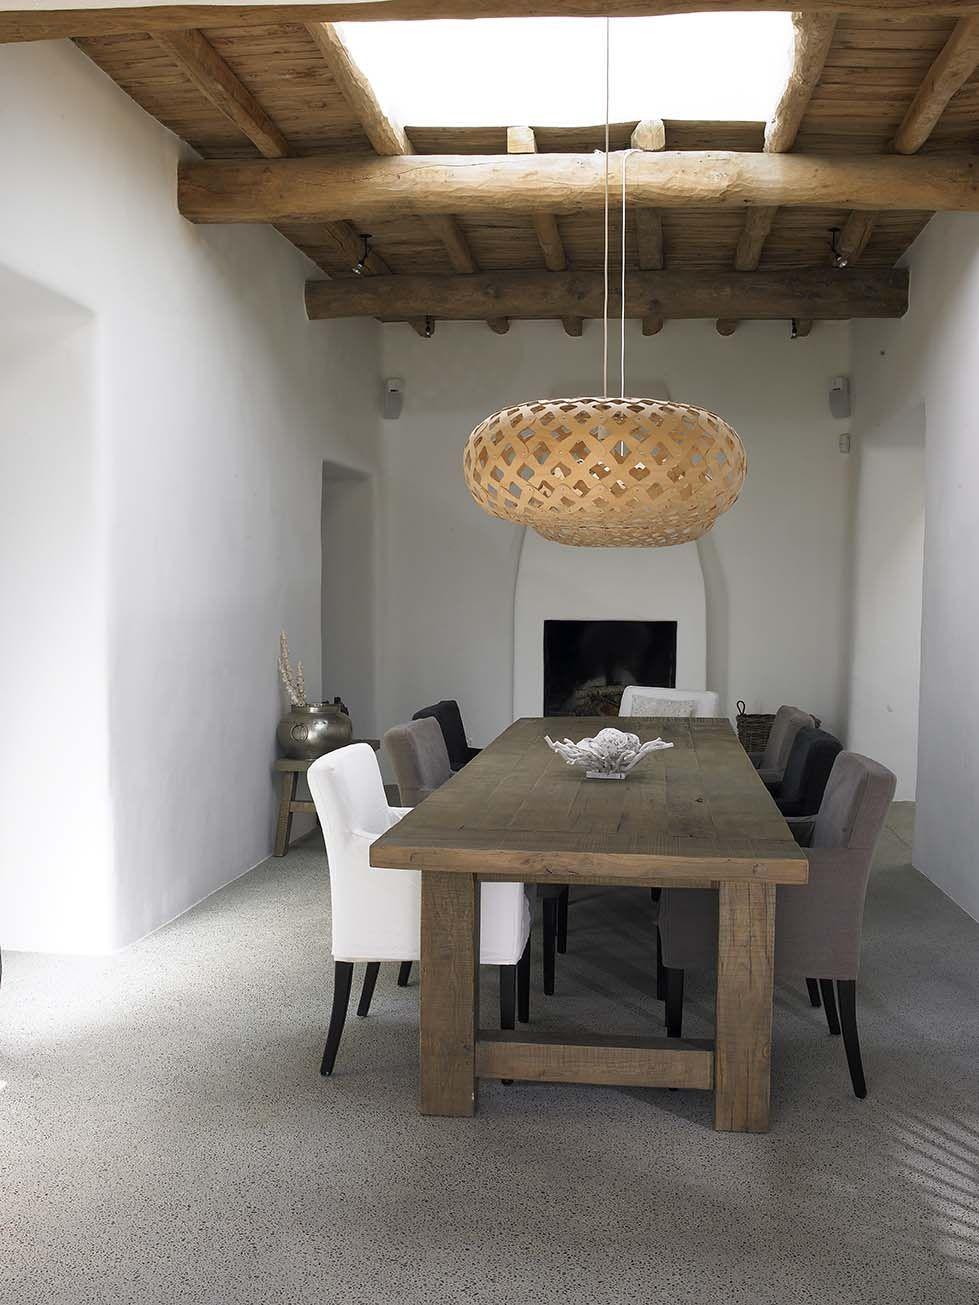 COCOON Ibiza villa design inspiration bycocooncom